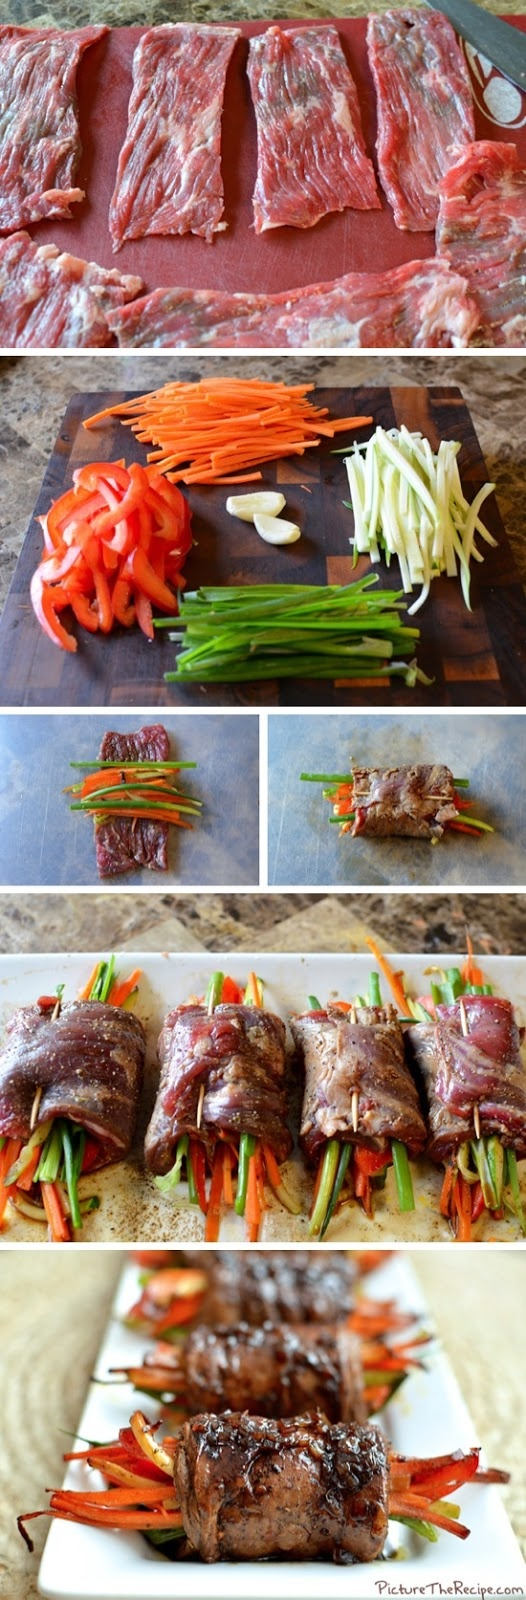 recipesthatareamazing: Balsamic Glazed Steak Rolls